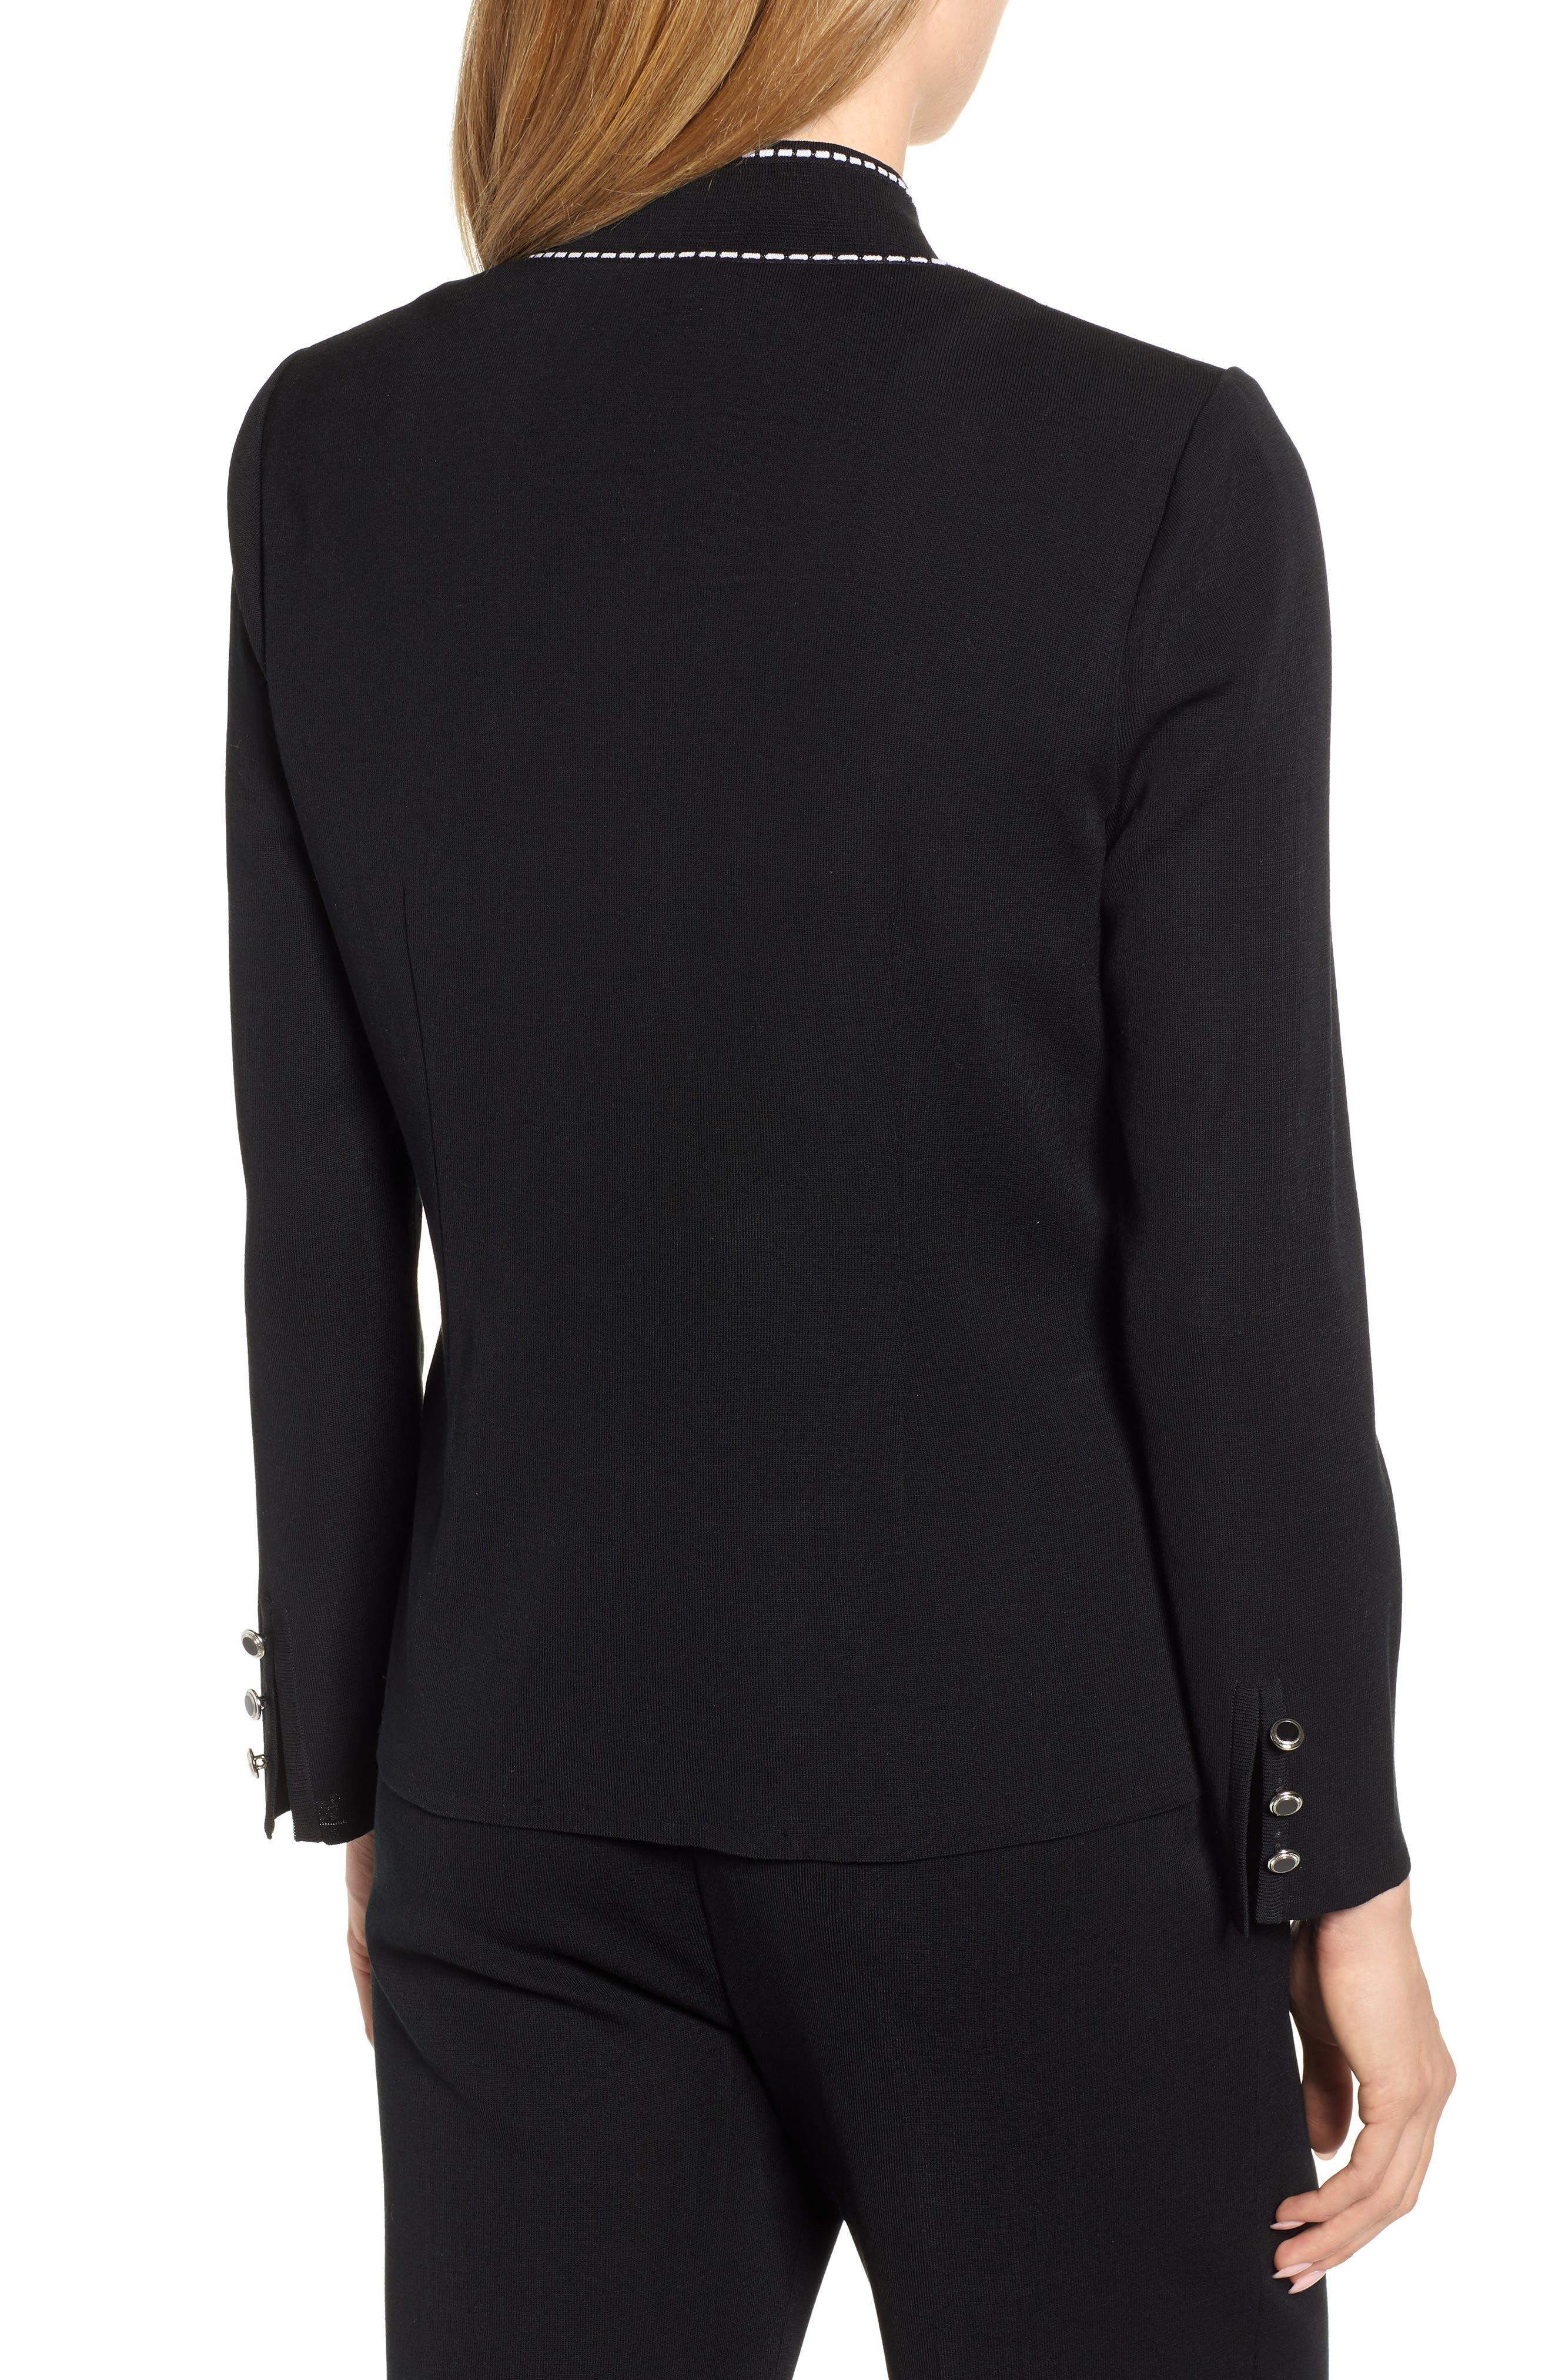 Contrast Jacquard Sweater Jacket,                             Alternate thumbnail 2, color,                             BLACK/ WHITE